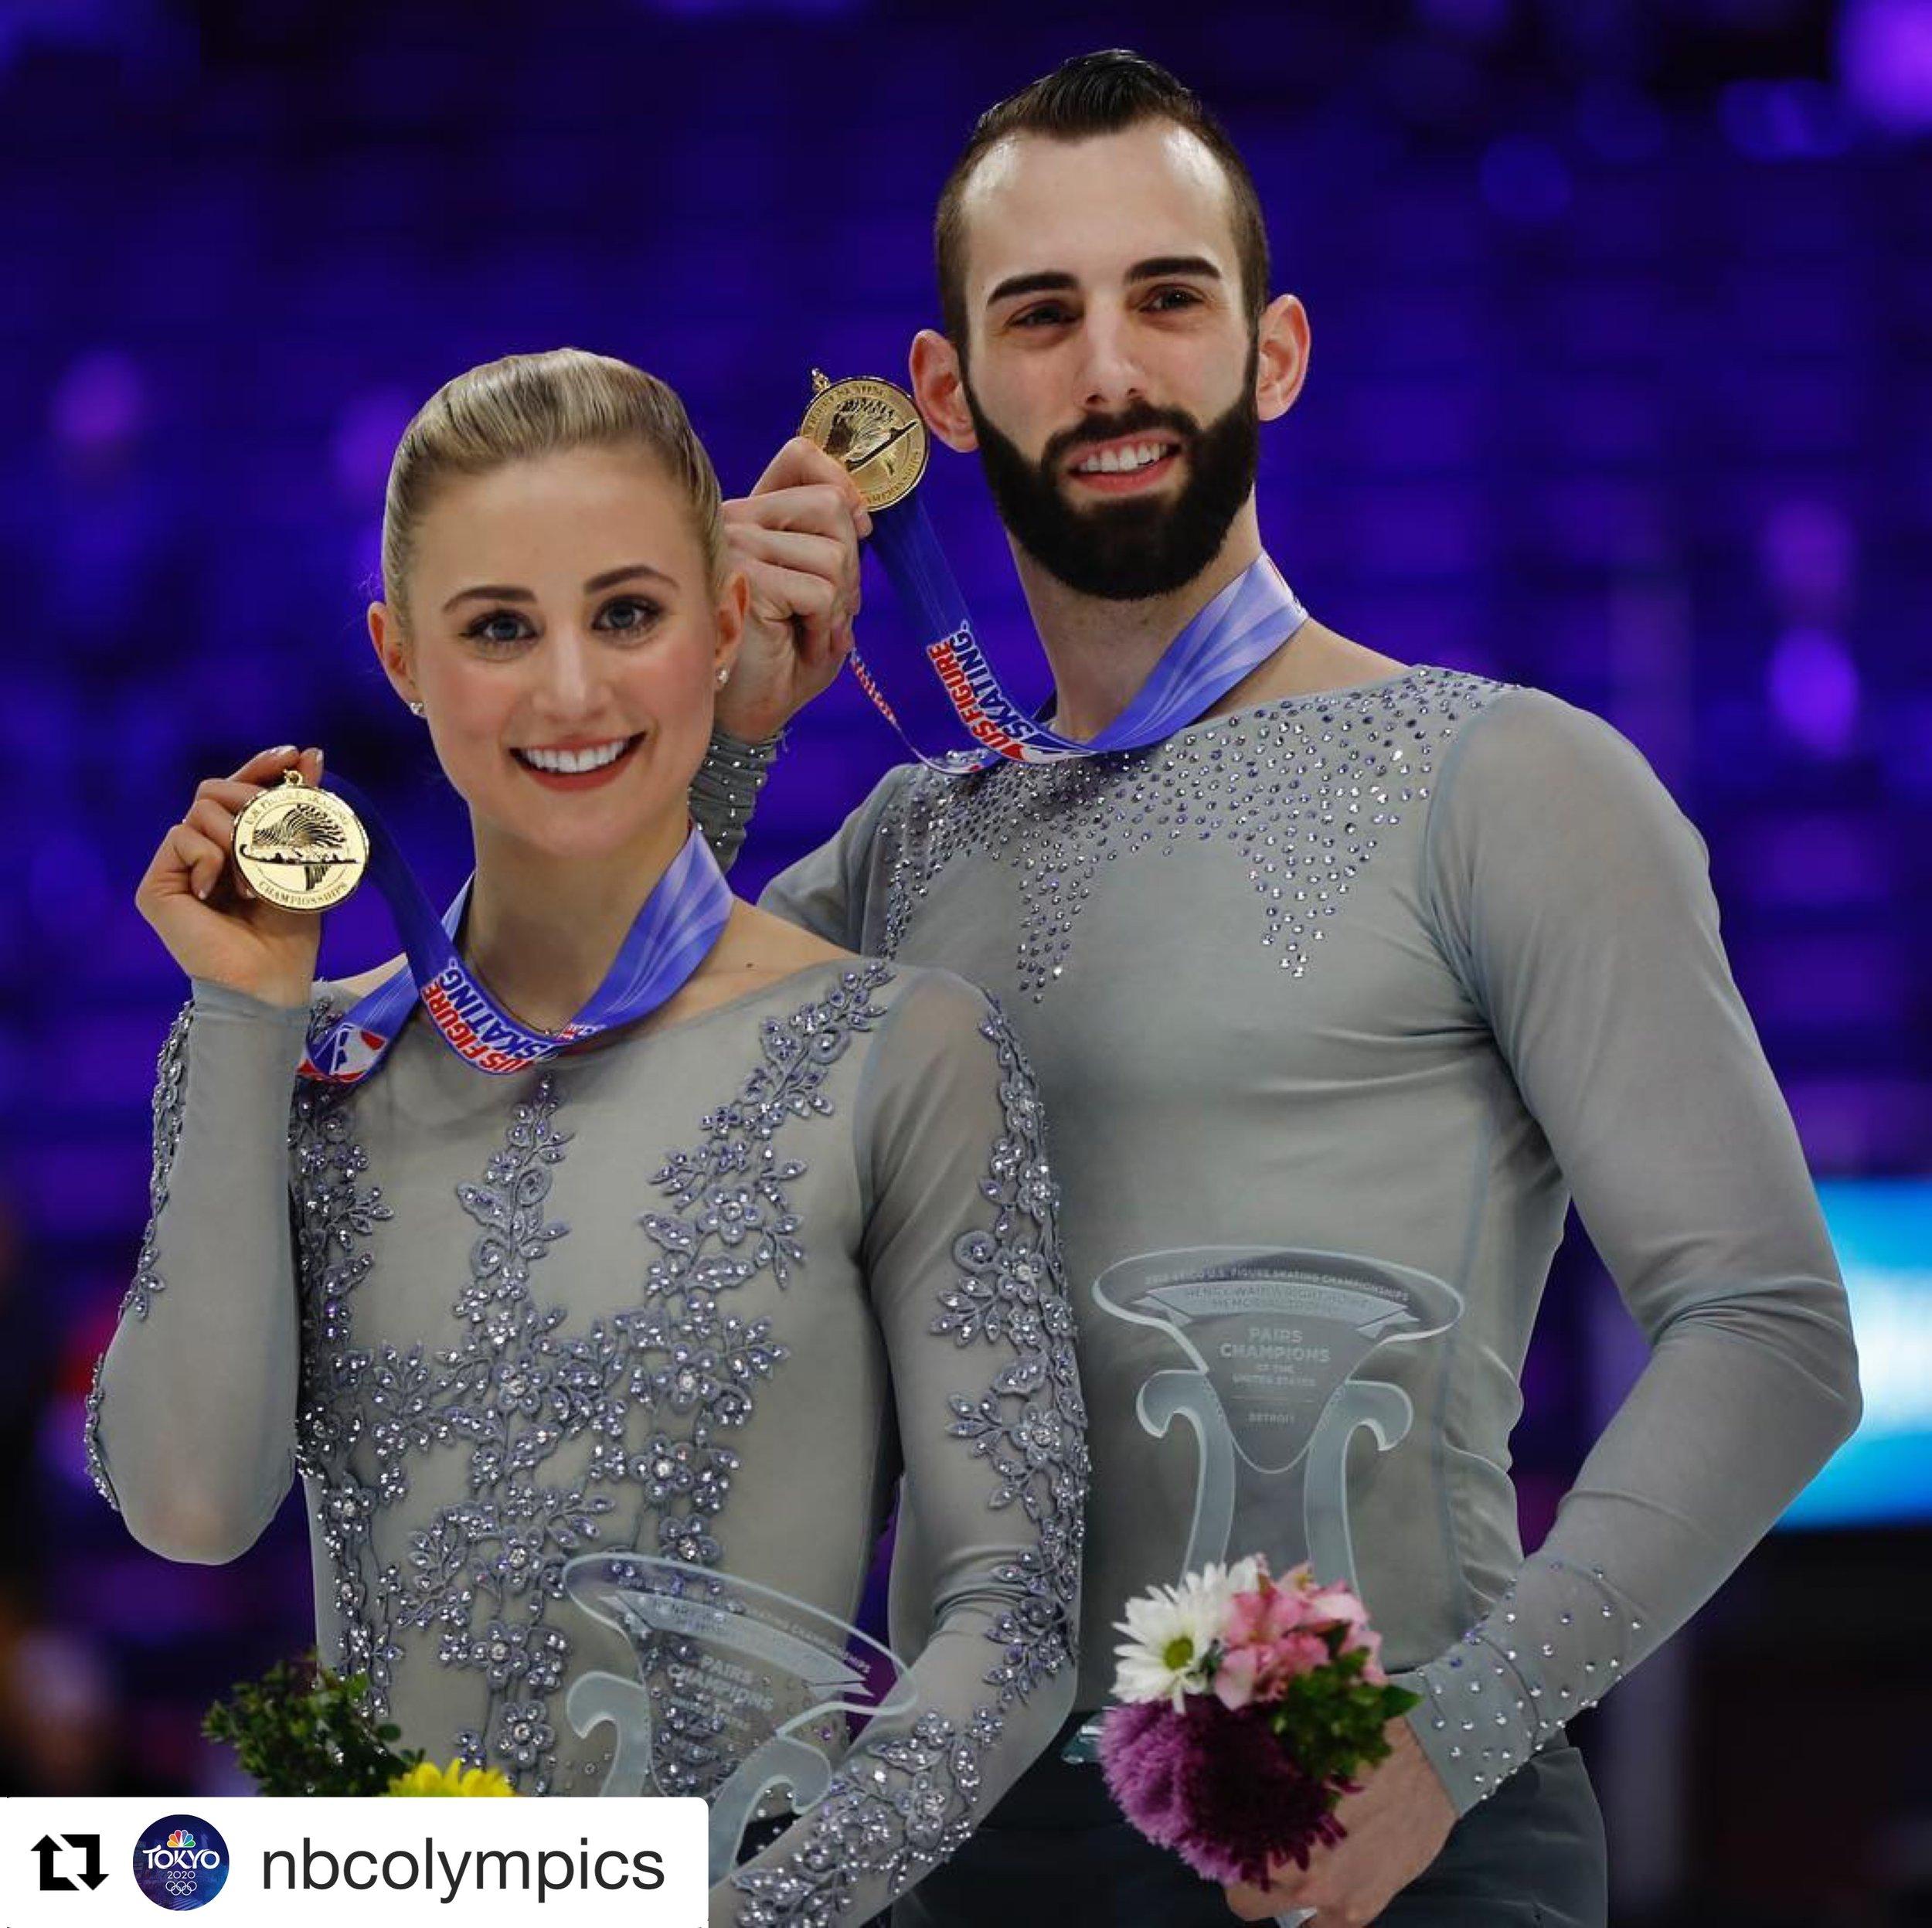 Ashley Cain & Timothy Leduc 2019 Senior Pairs National Champions